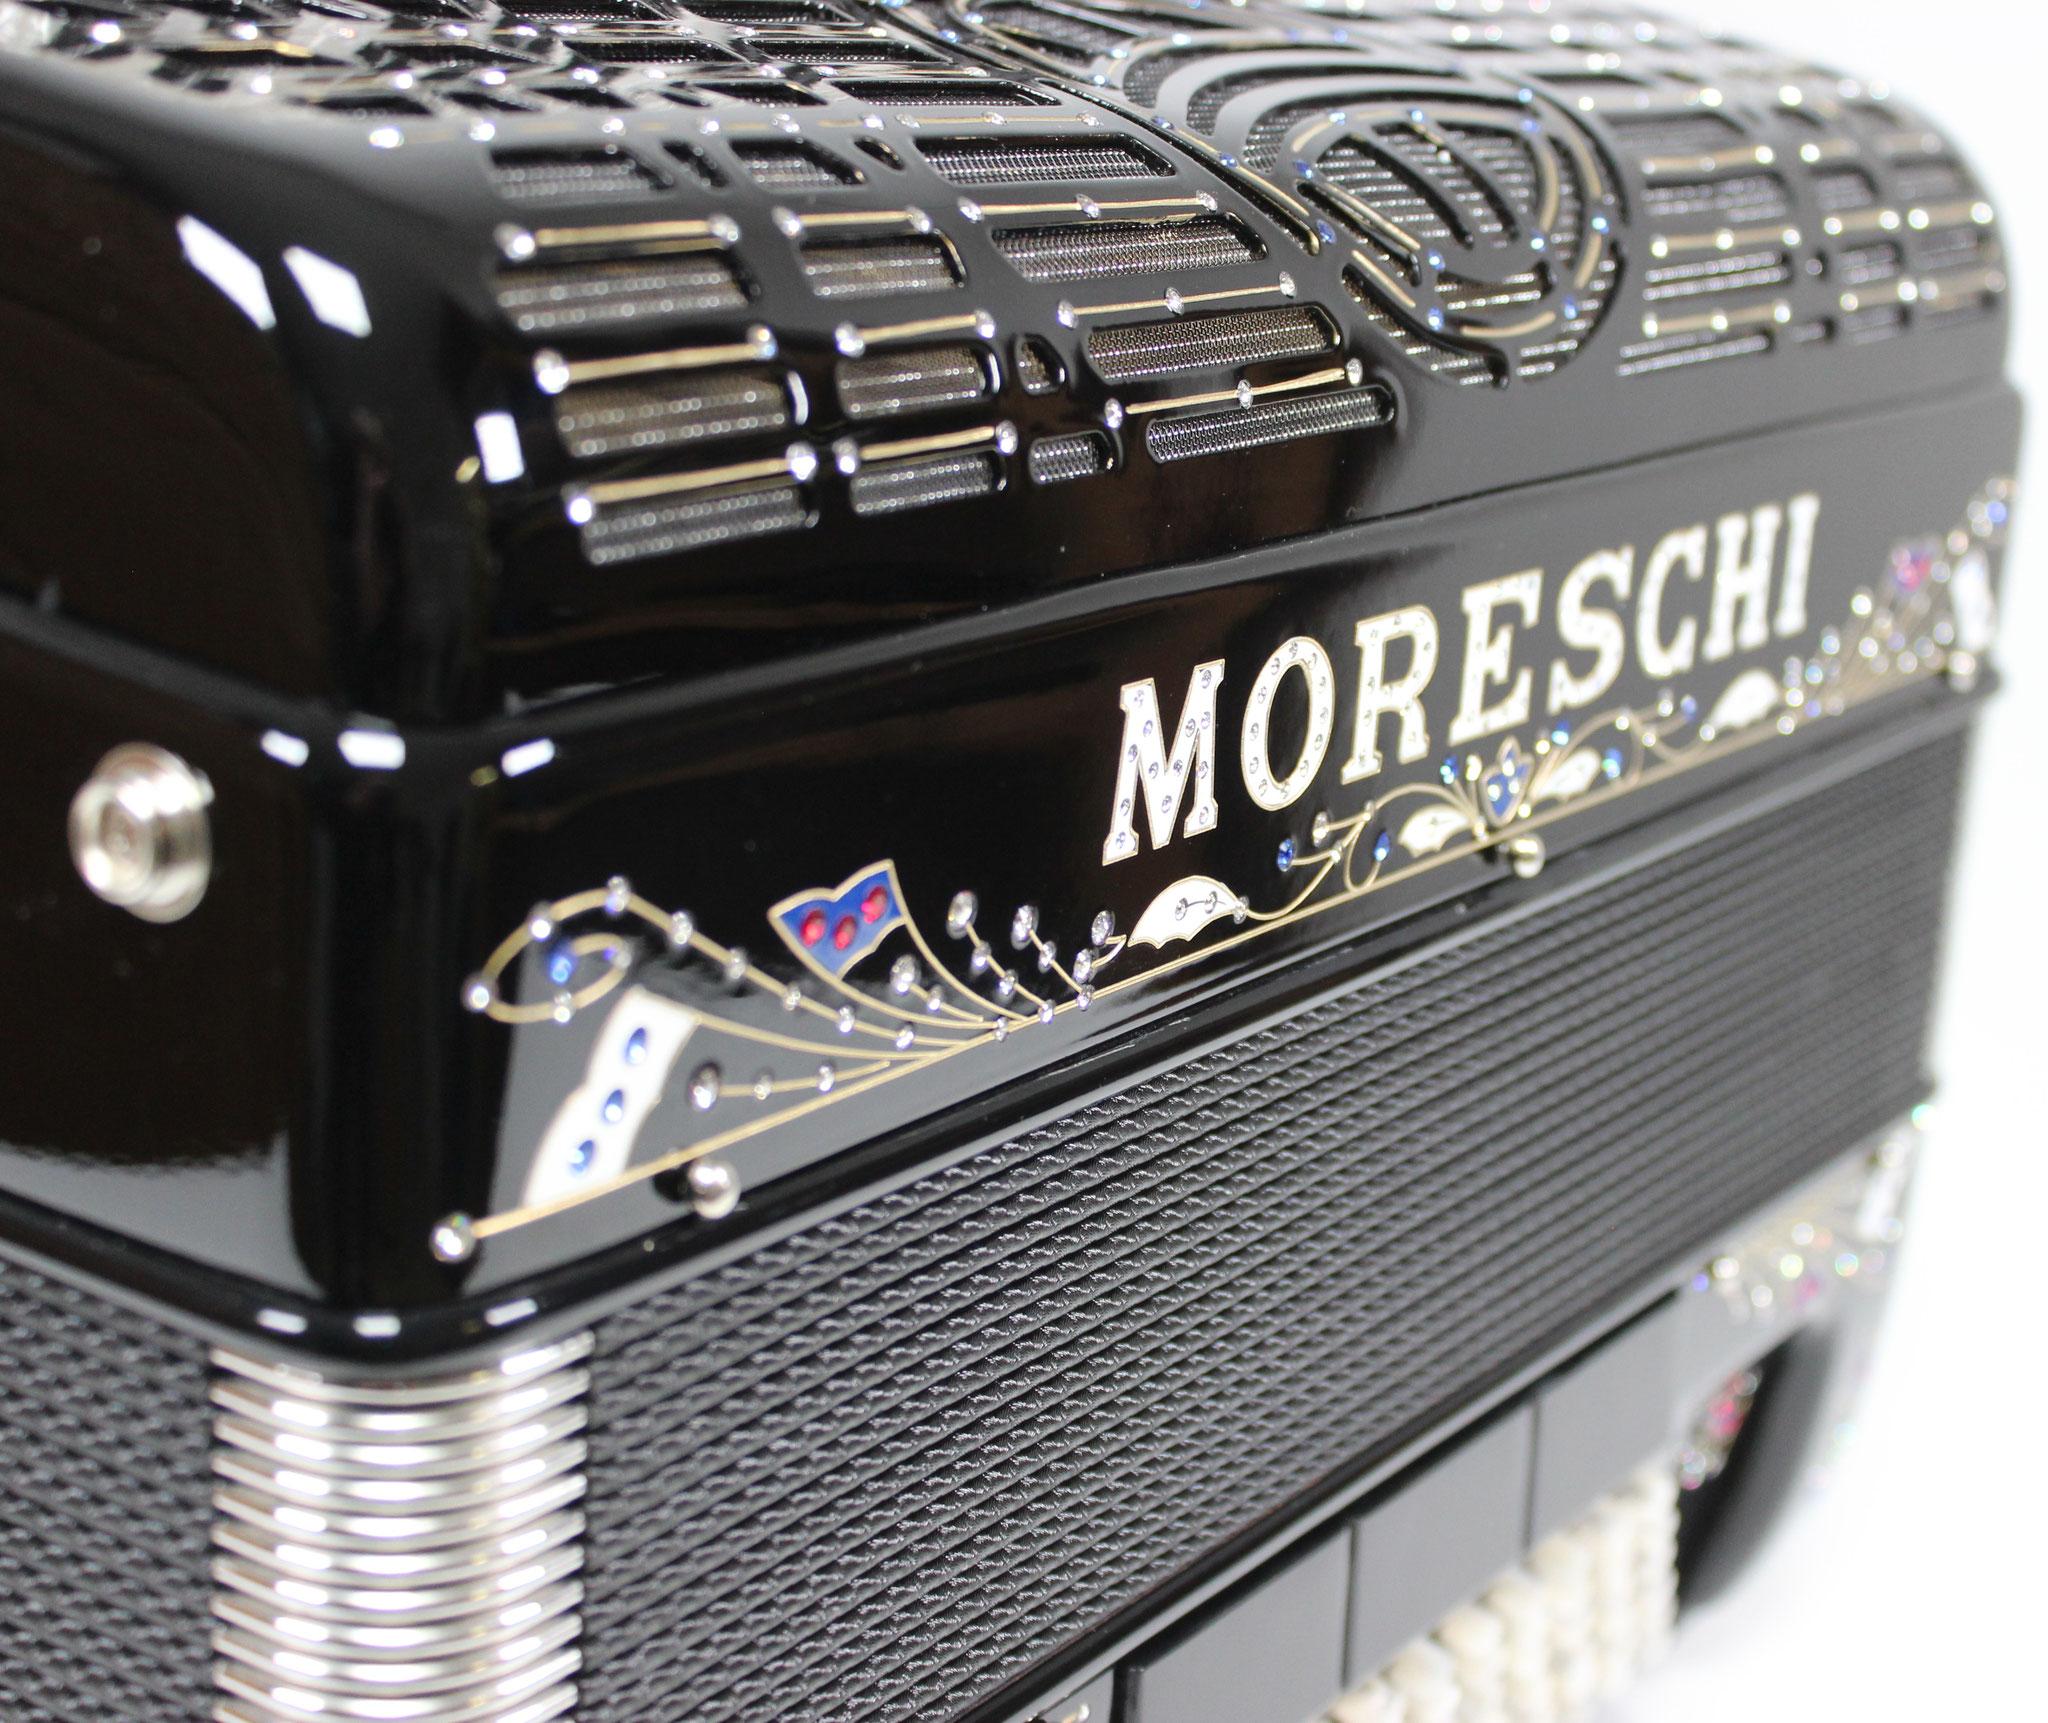 Moreschi Agile 34 IV 96 M, schwarz Strass